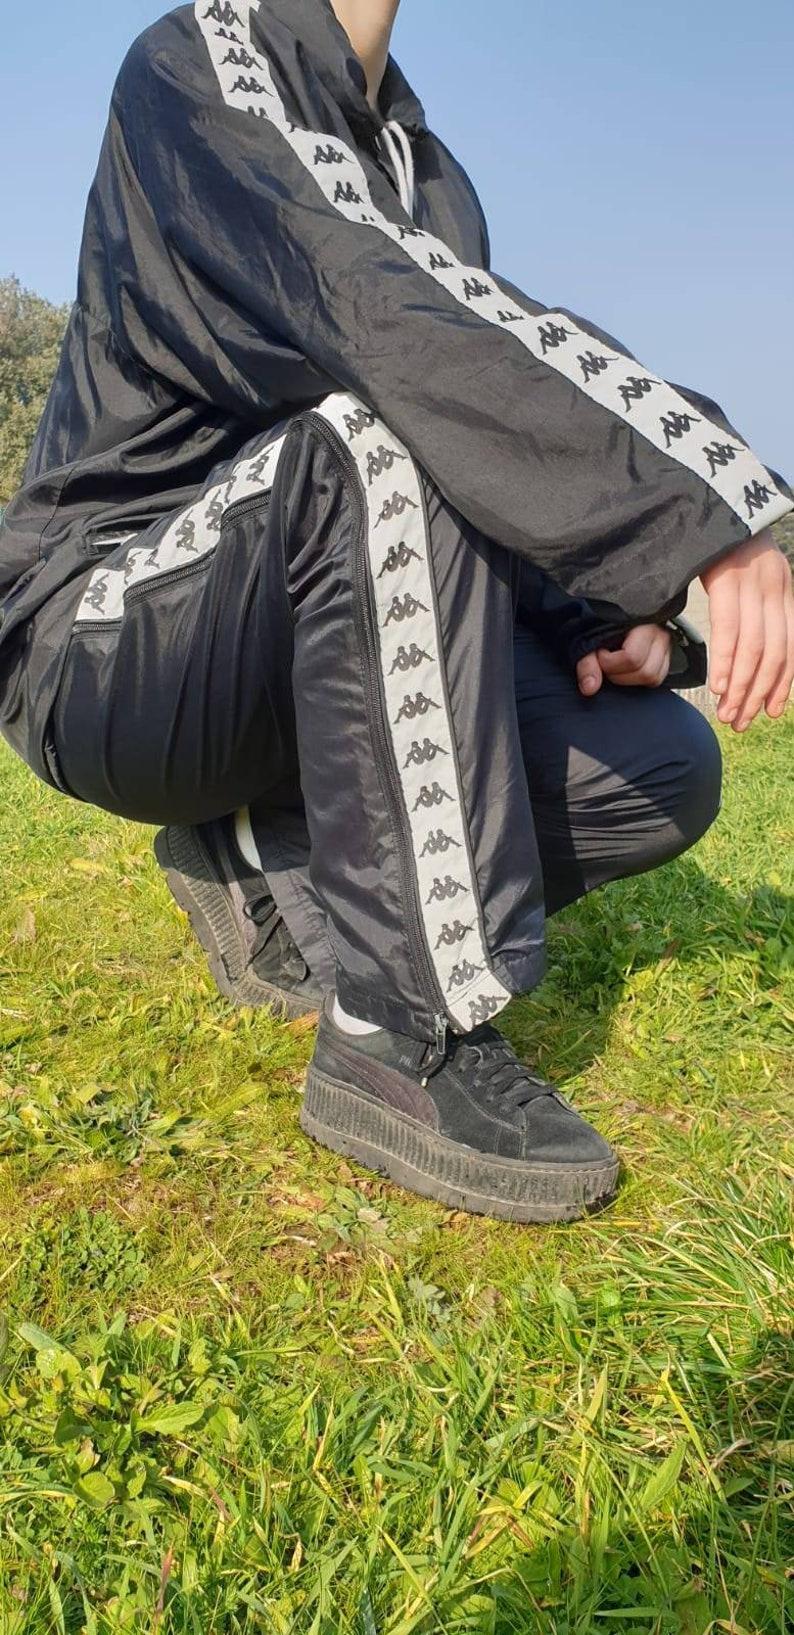 ee626d013d994 90s Kappa Tracksuit / Kappa Set / Mens Trackie / Sweater / Hoodie / Black /  Size XL L / Sweatshirt / Top / Tapered Logo / Vintage Kappa set